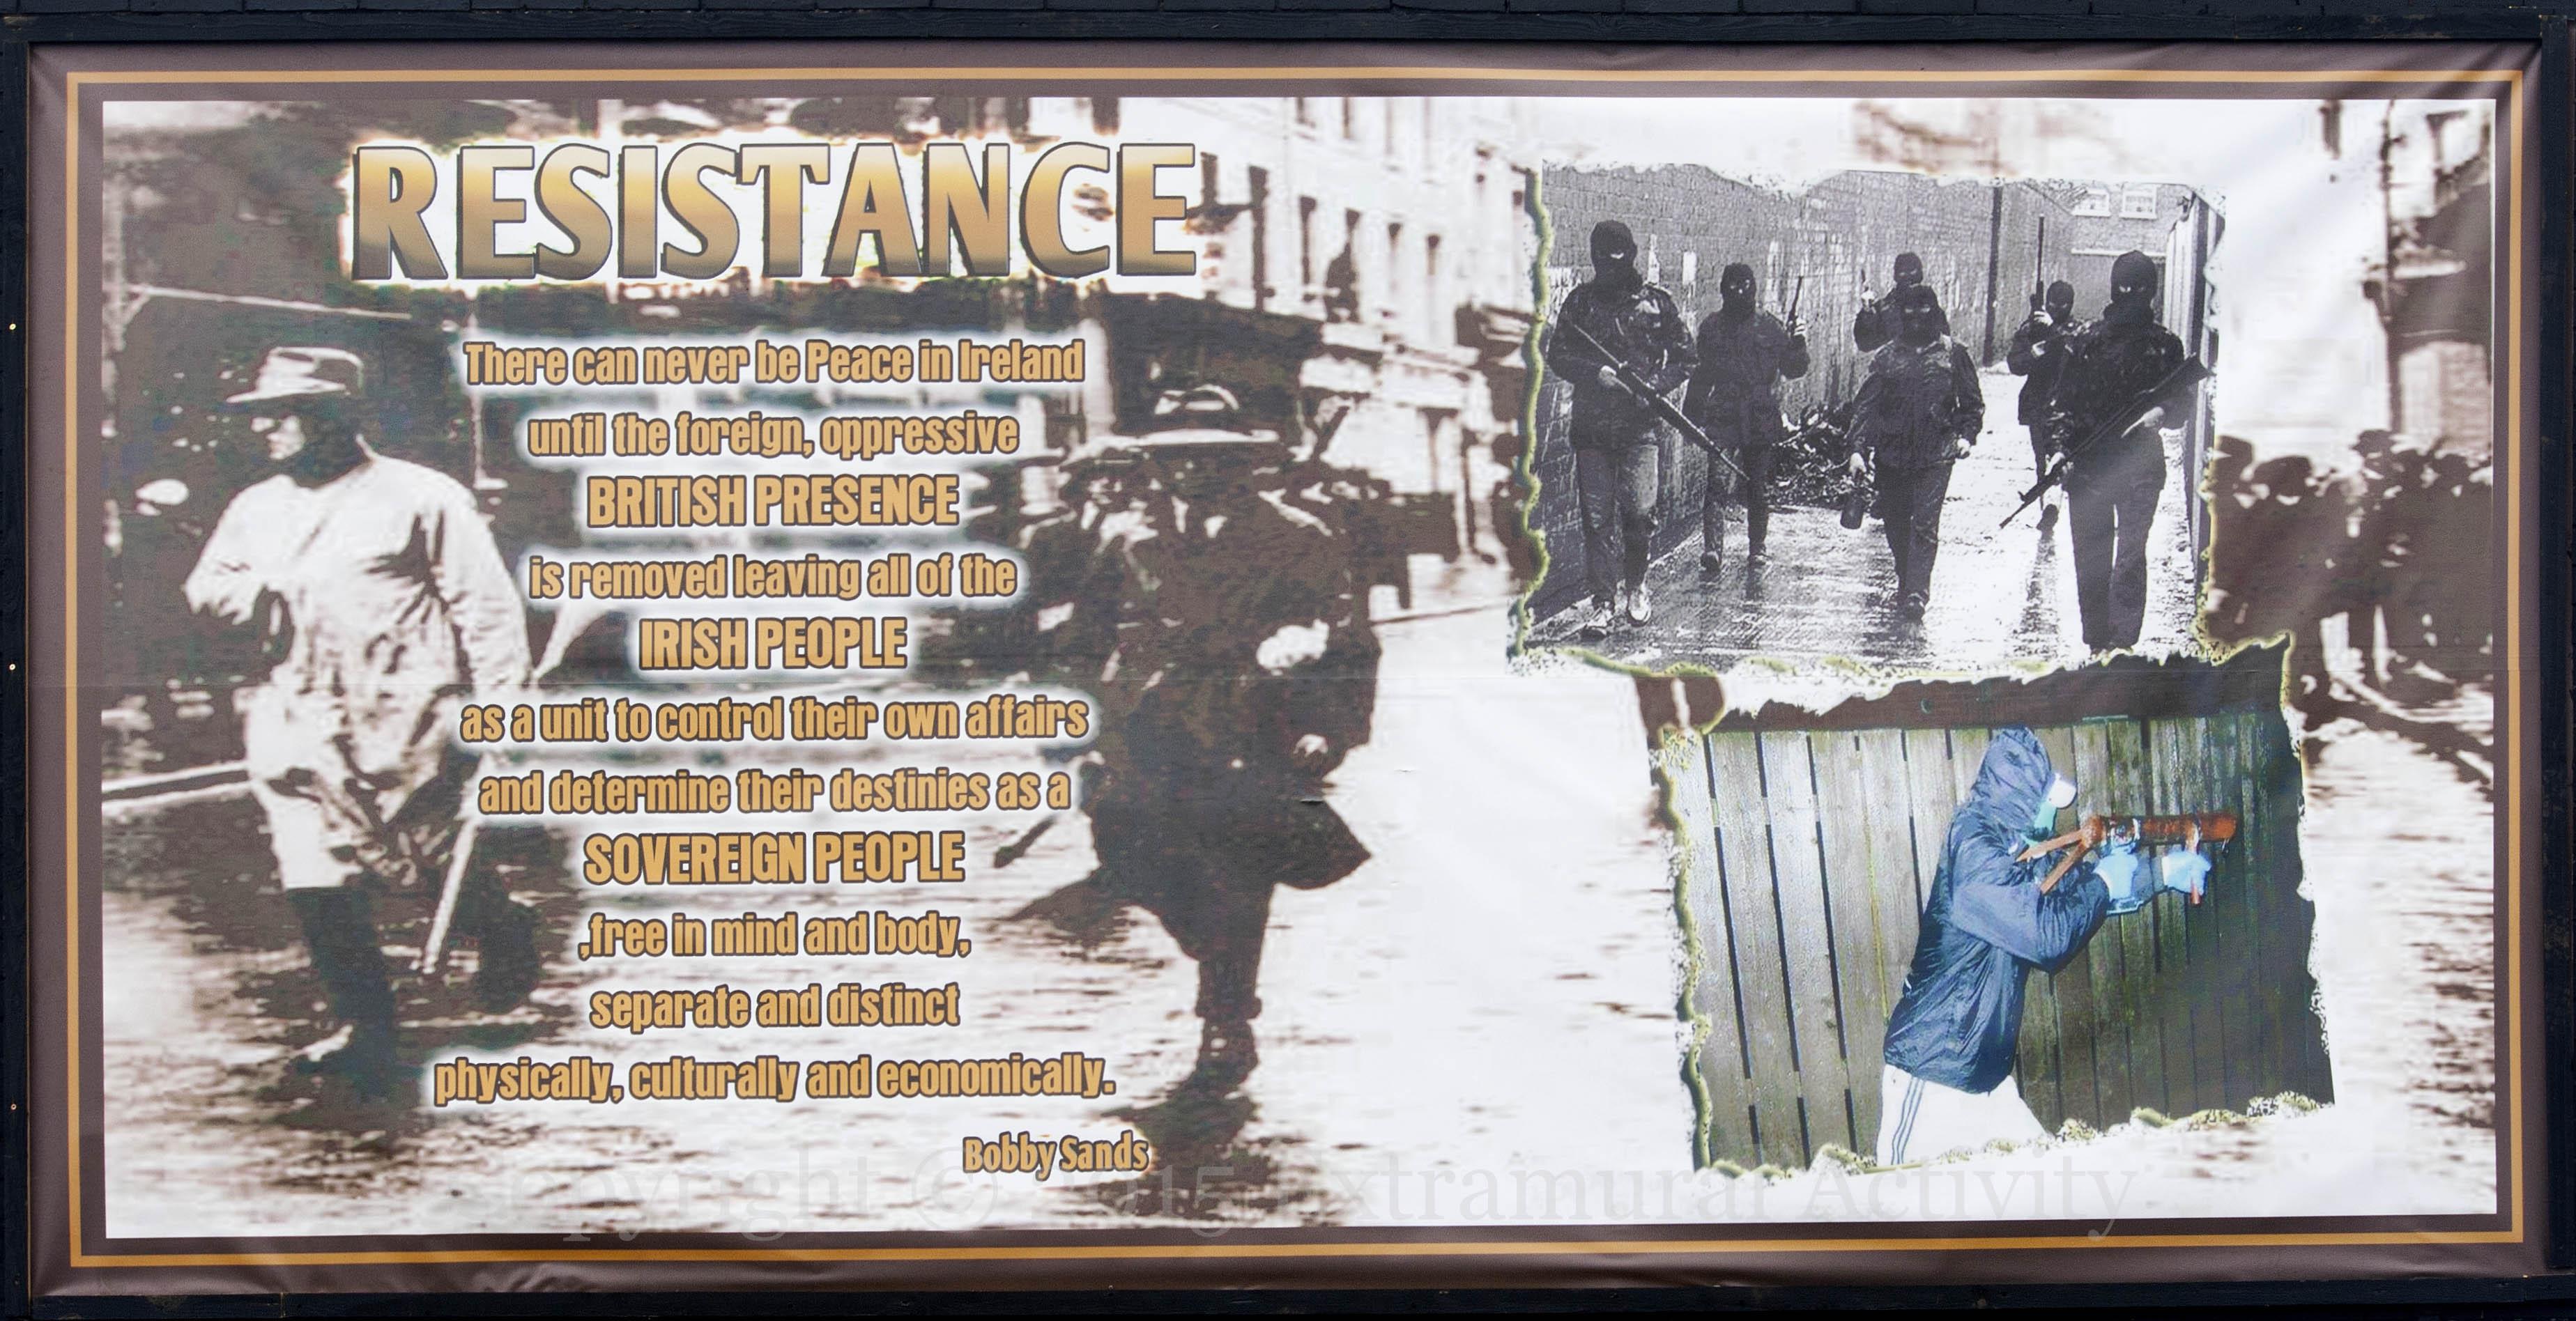 2015-04-14 Resistance+